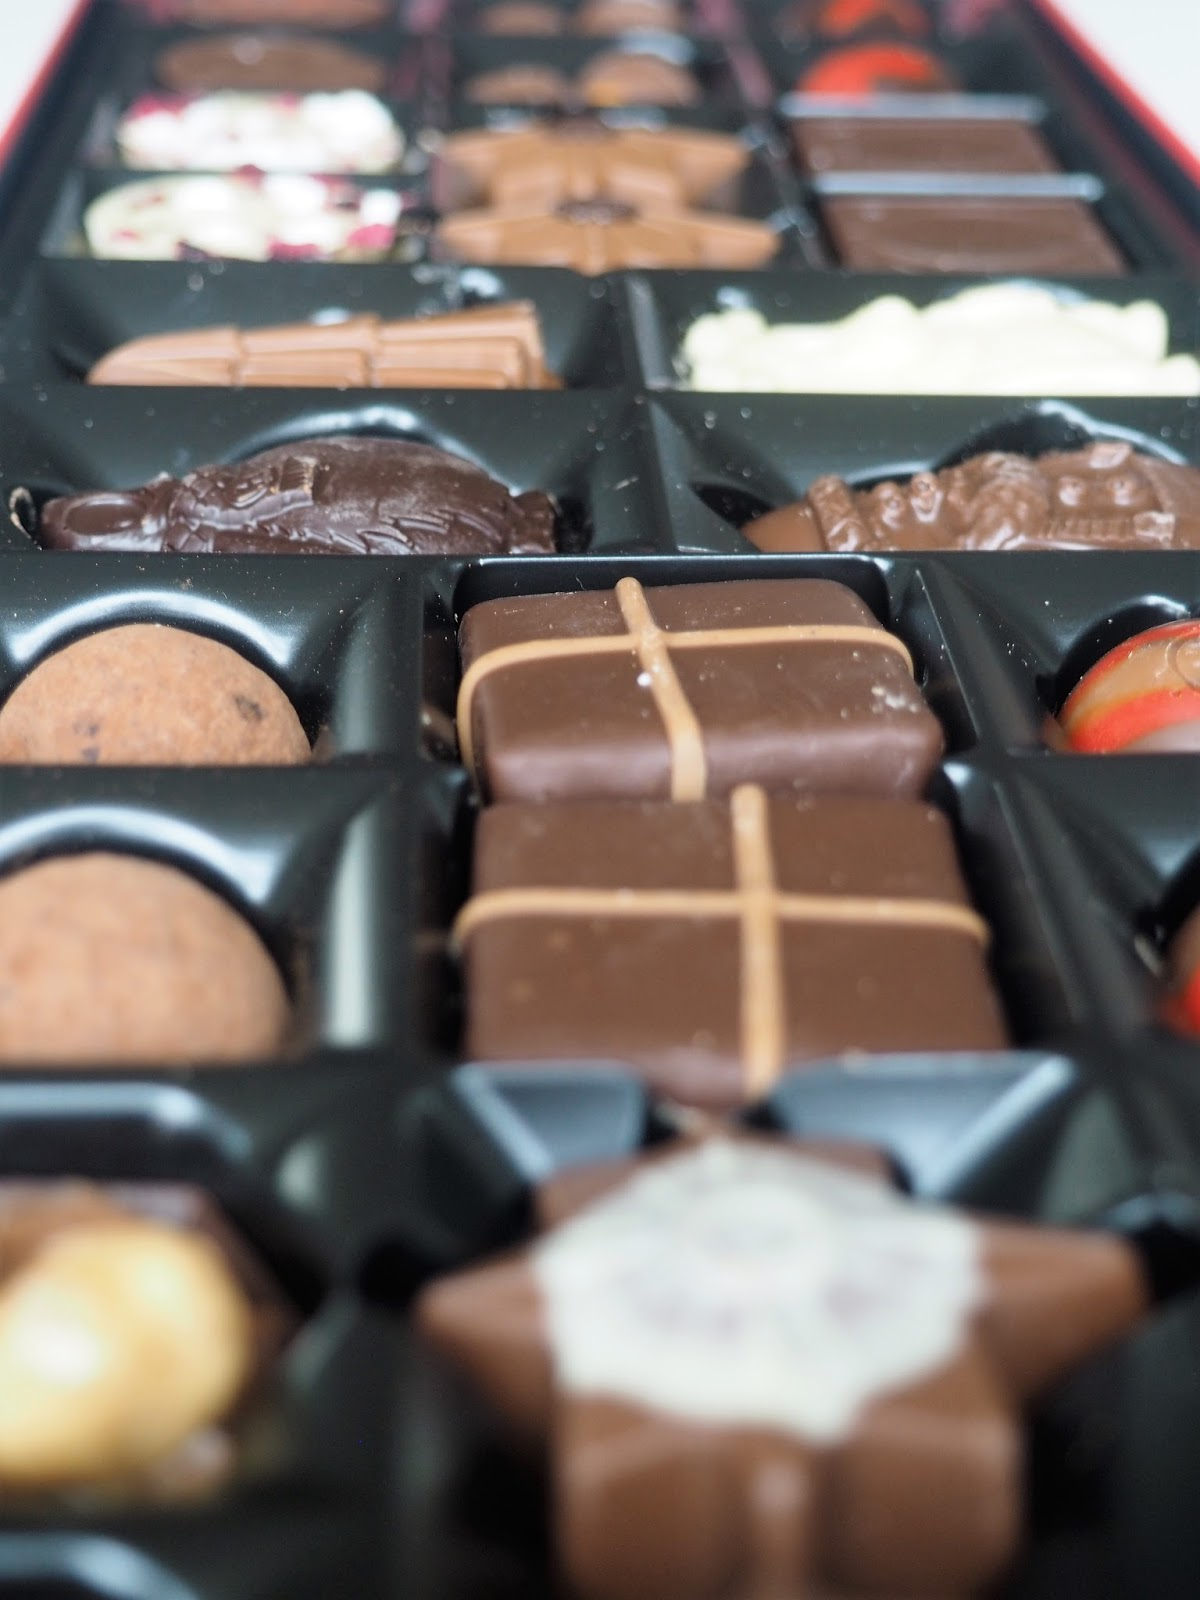 Hotel Chocolat classic Christmas sleekster